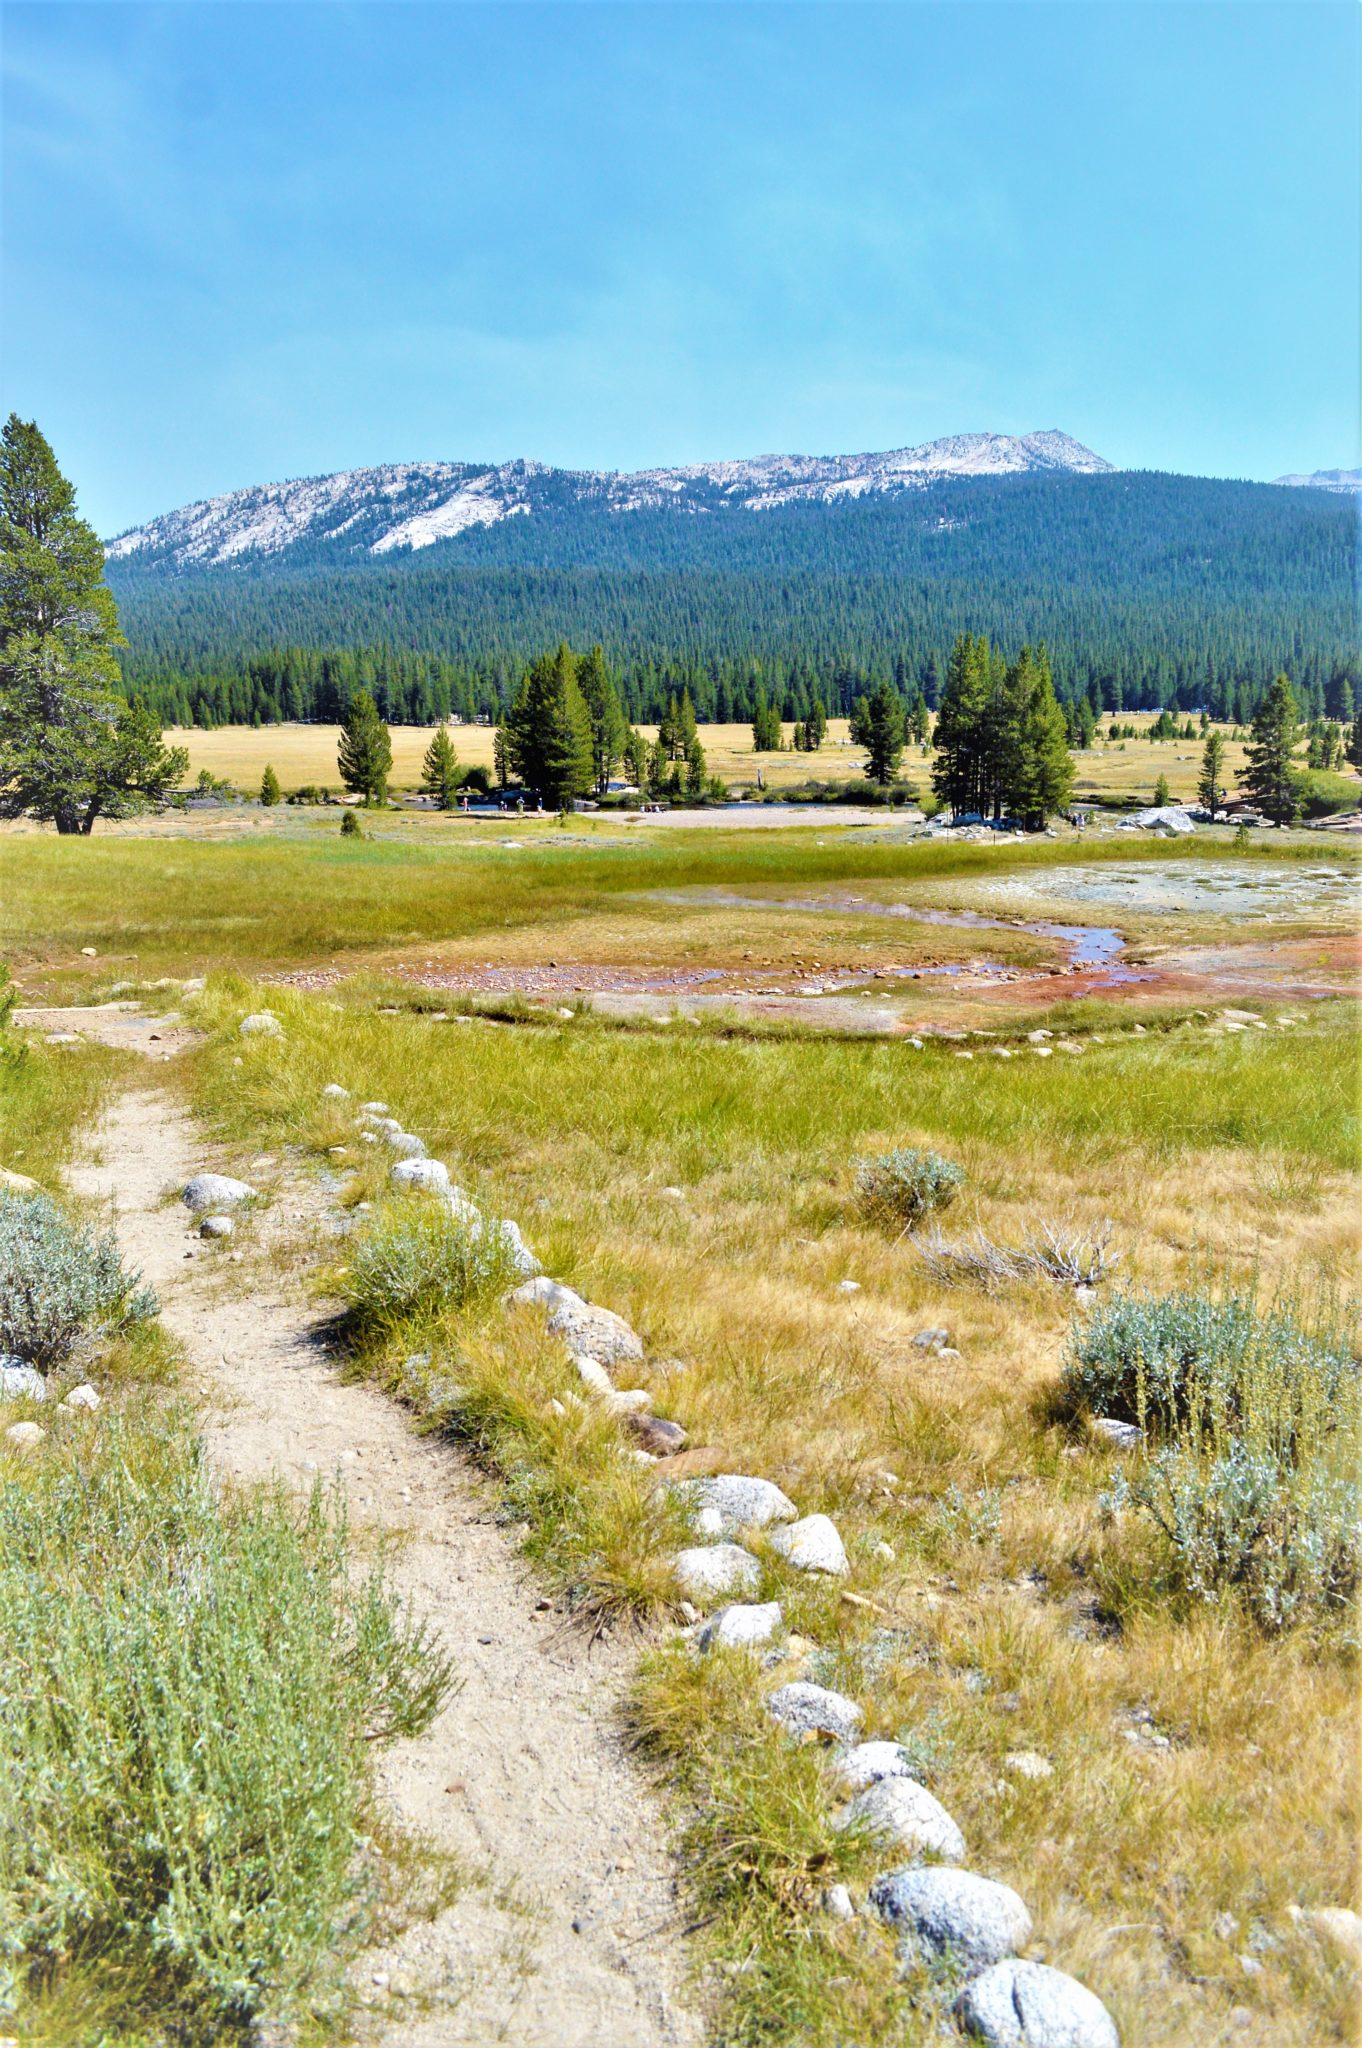 Trail, PCT, Yosemite National Park, California